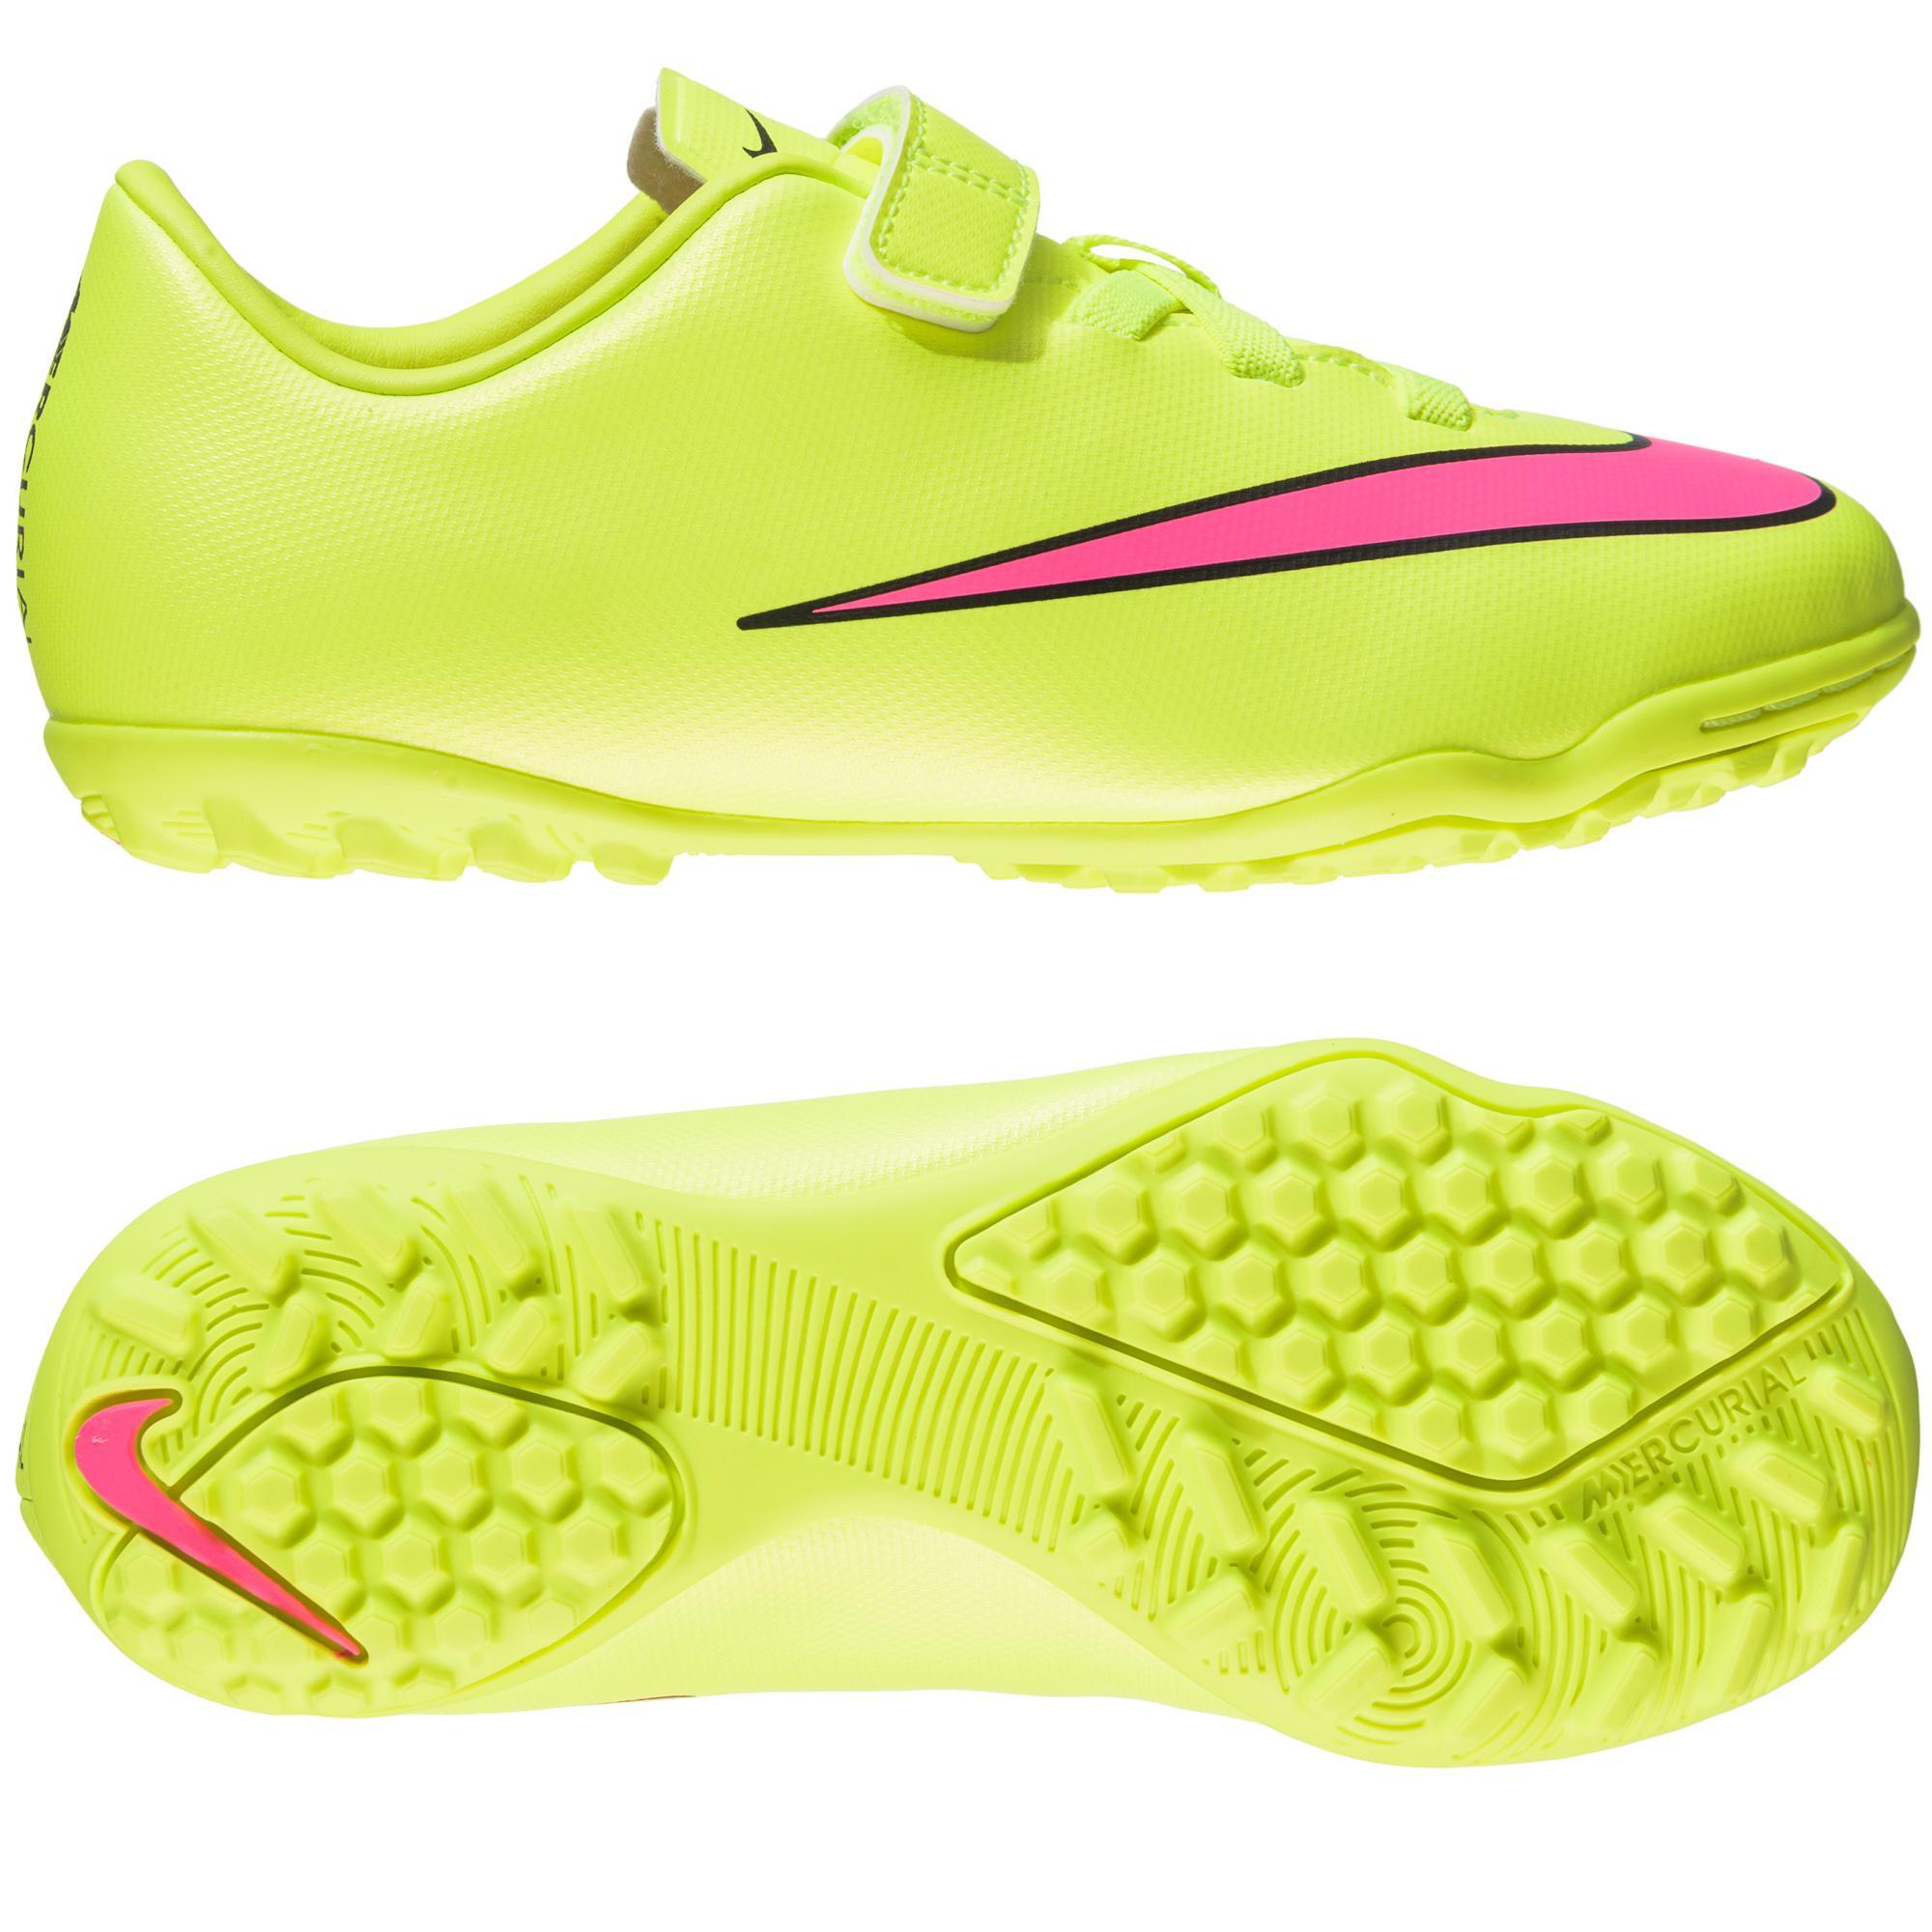 Nike Mercurial Victory V TF Neon/Rosa/Svart Barn